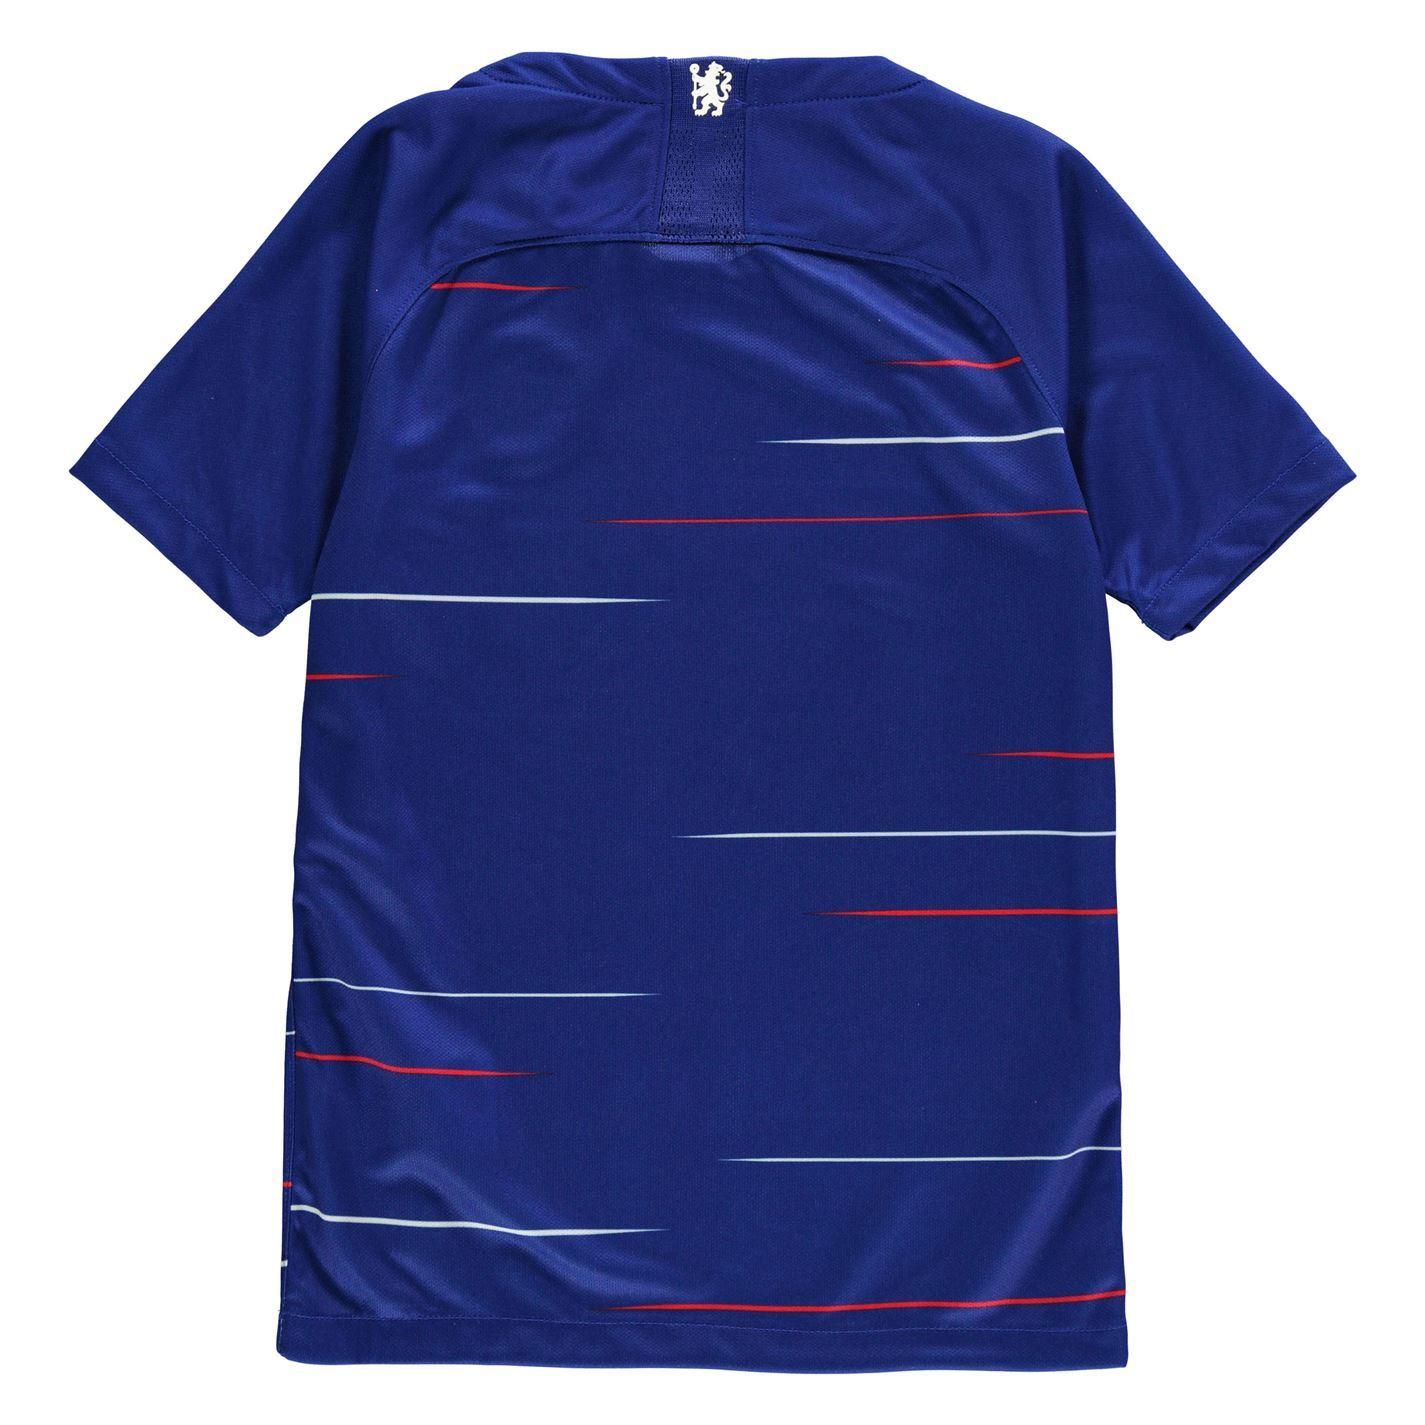 4eb1ced2d Nike Chelsea Home Jersey 2018 2019 Juniors Blue Football Soccer Fan Shirt  Top